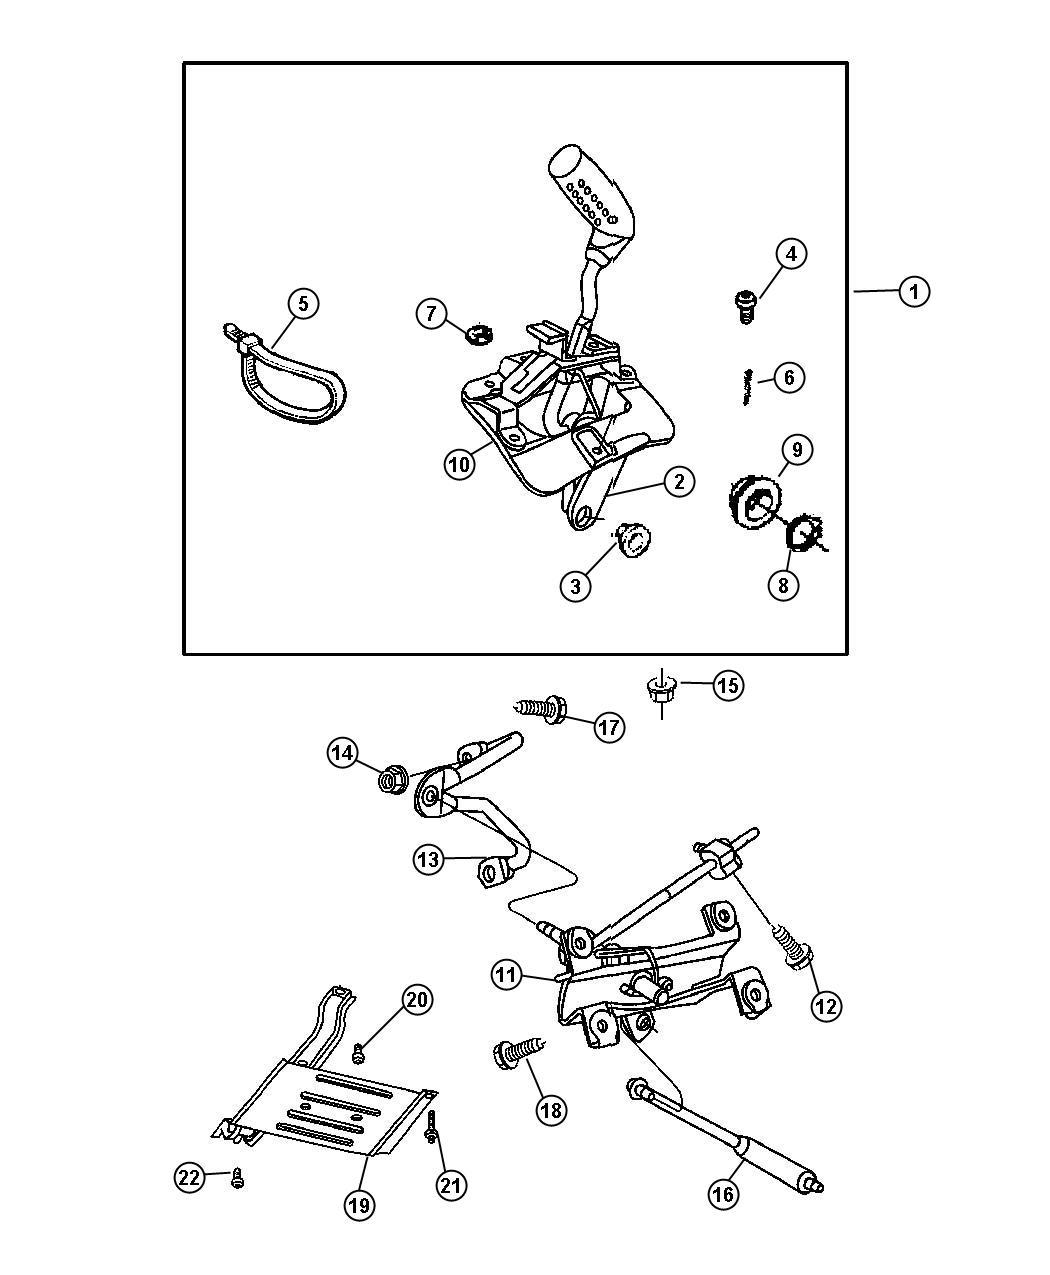 Jeep Wrangler Housing. Shift lever. Controlsskid